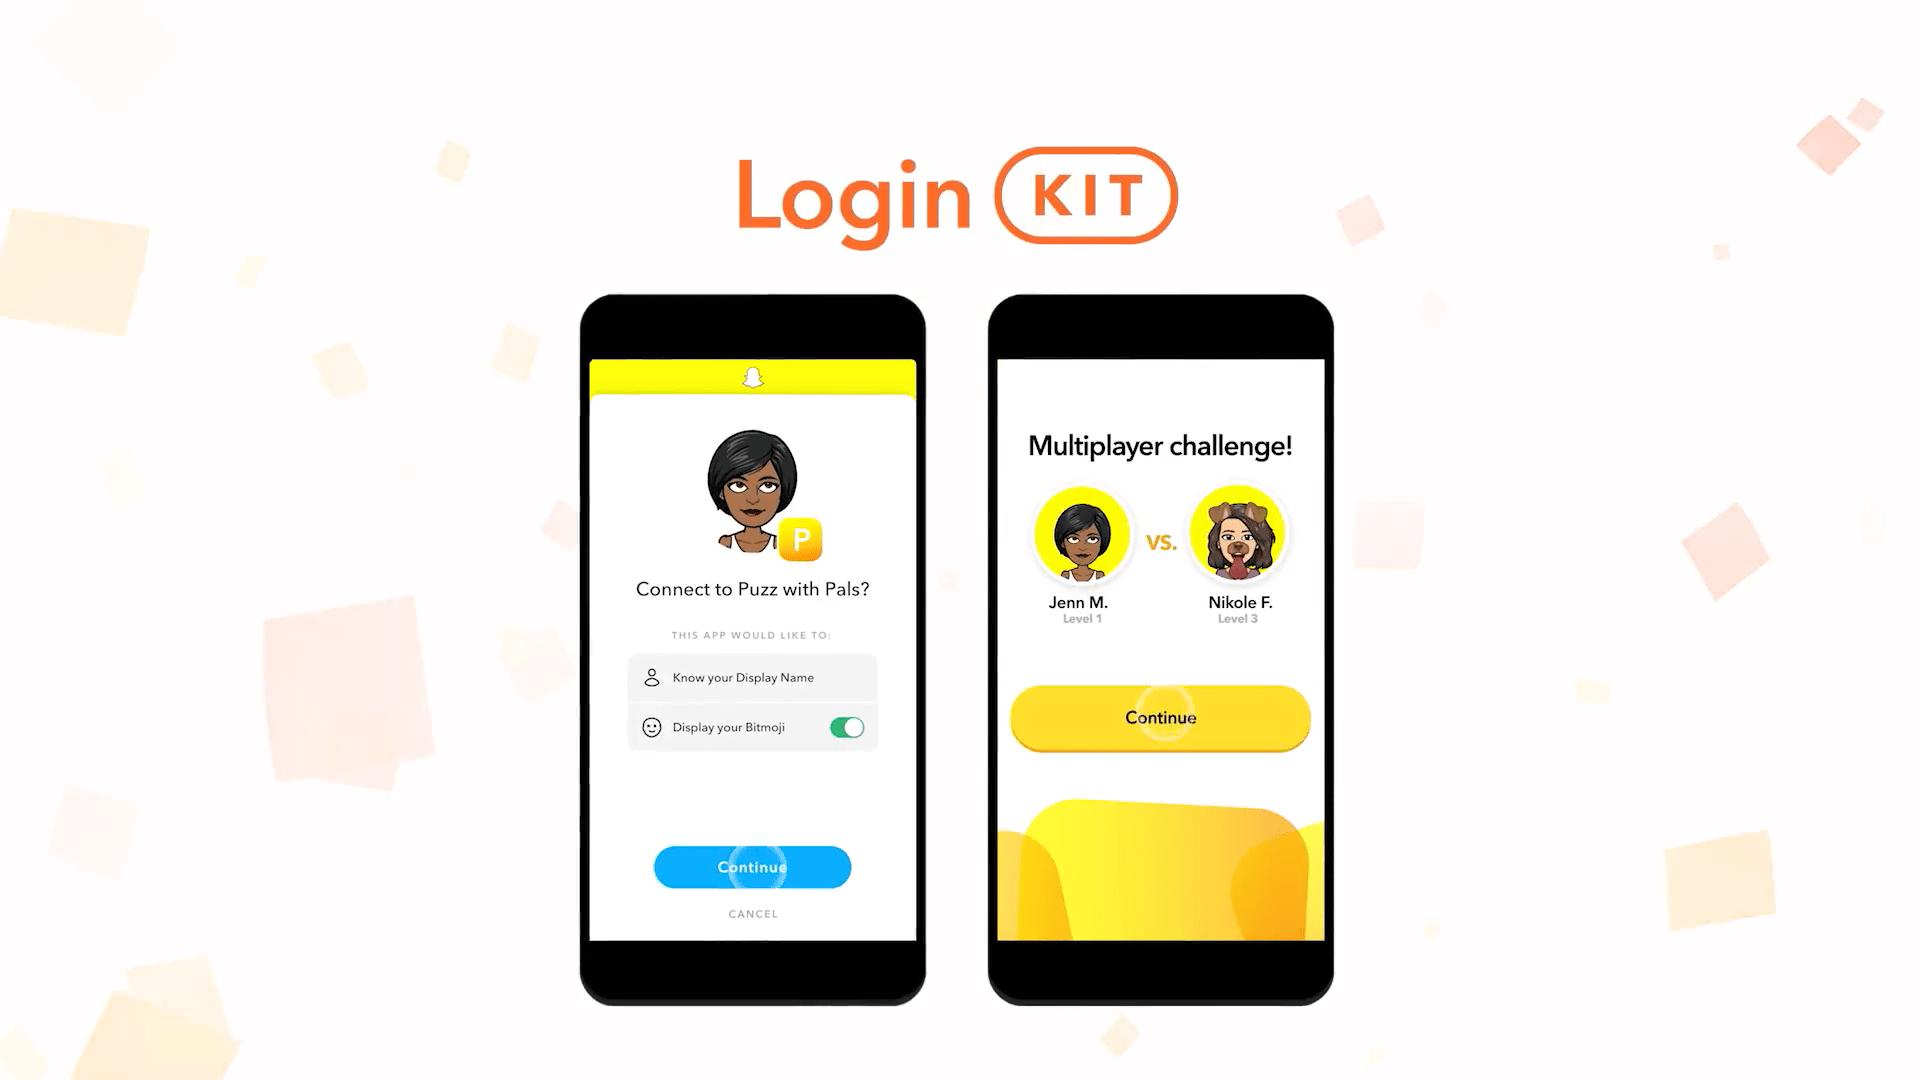 Login Kit Snapchat